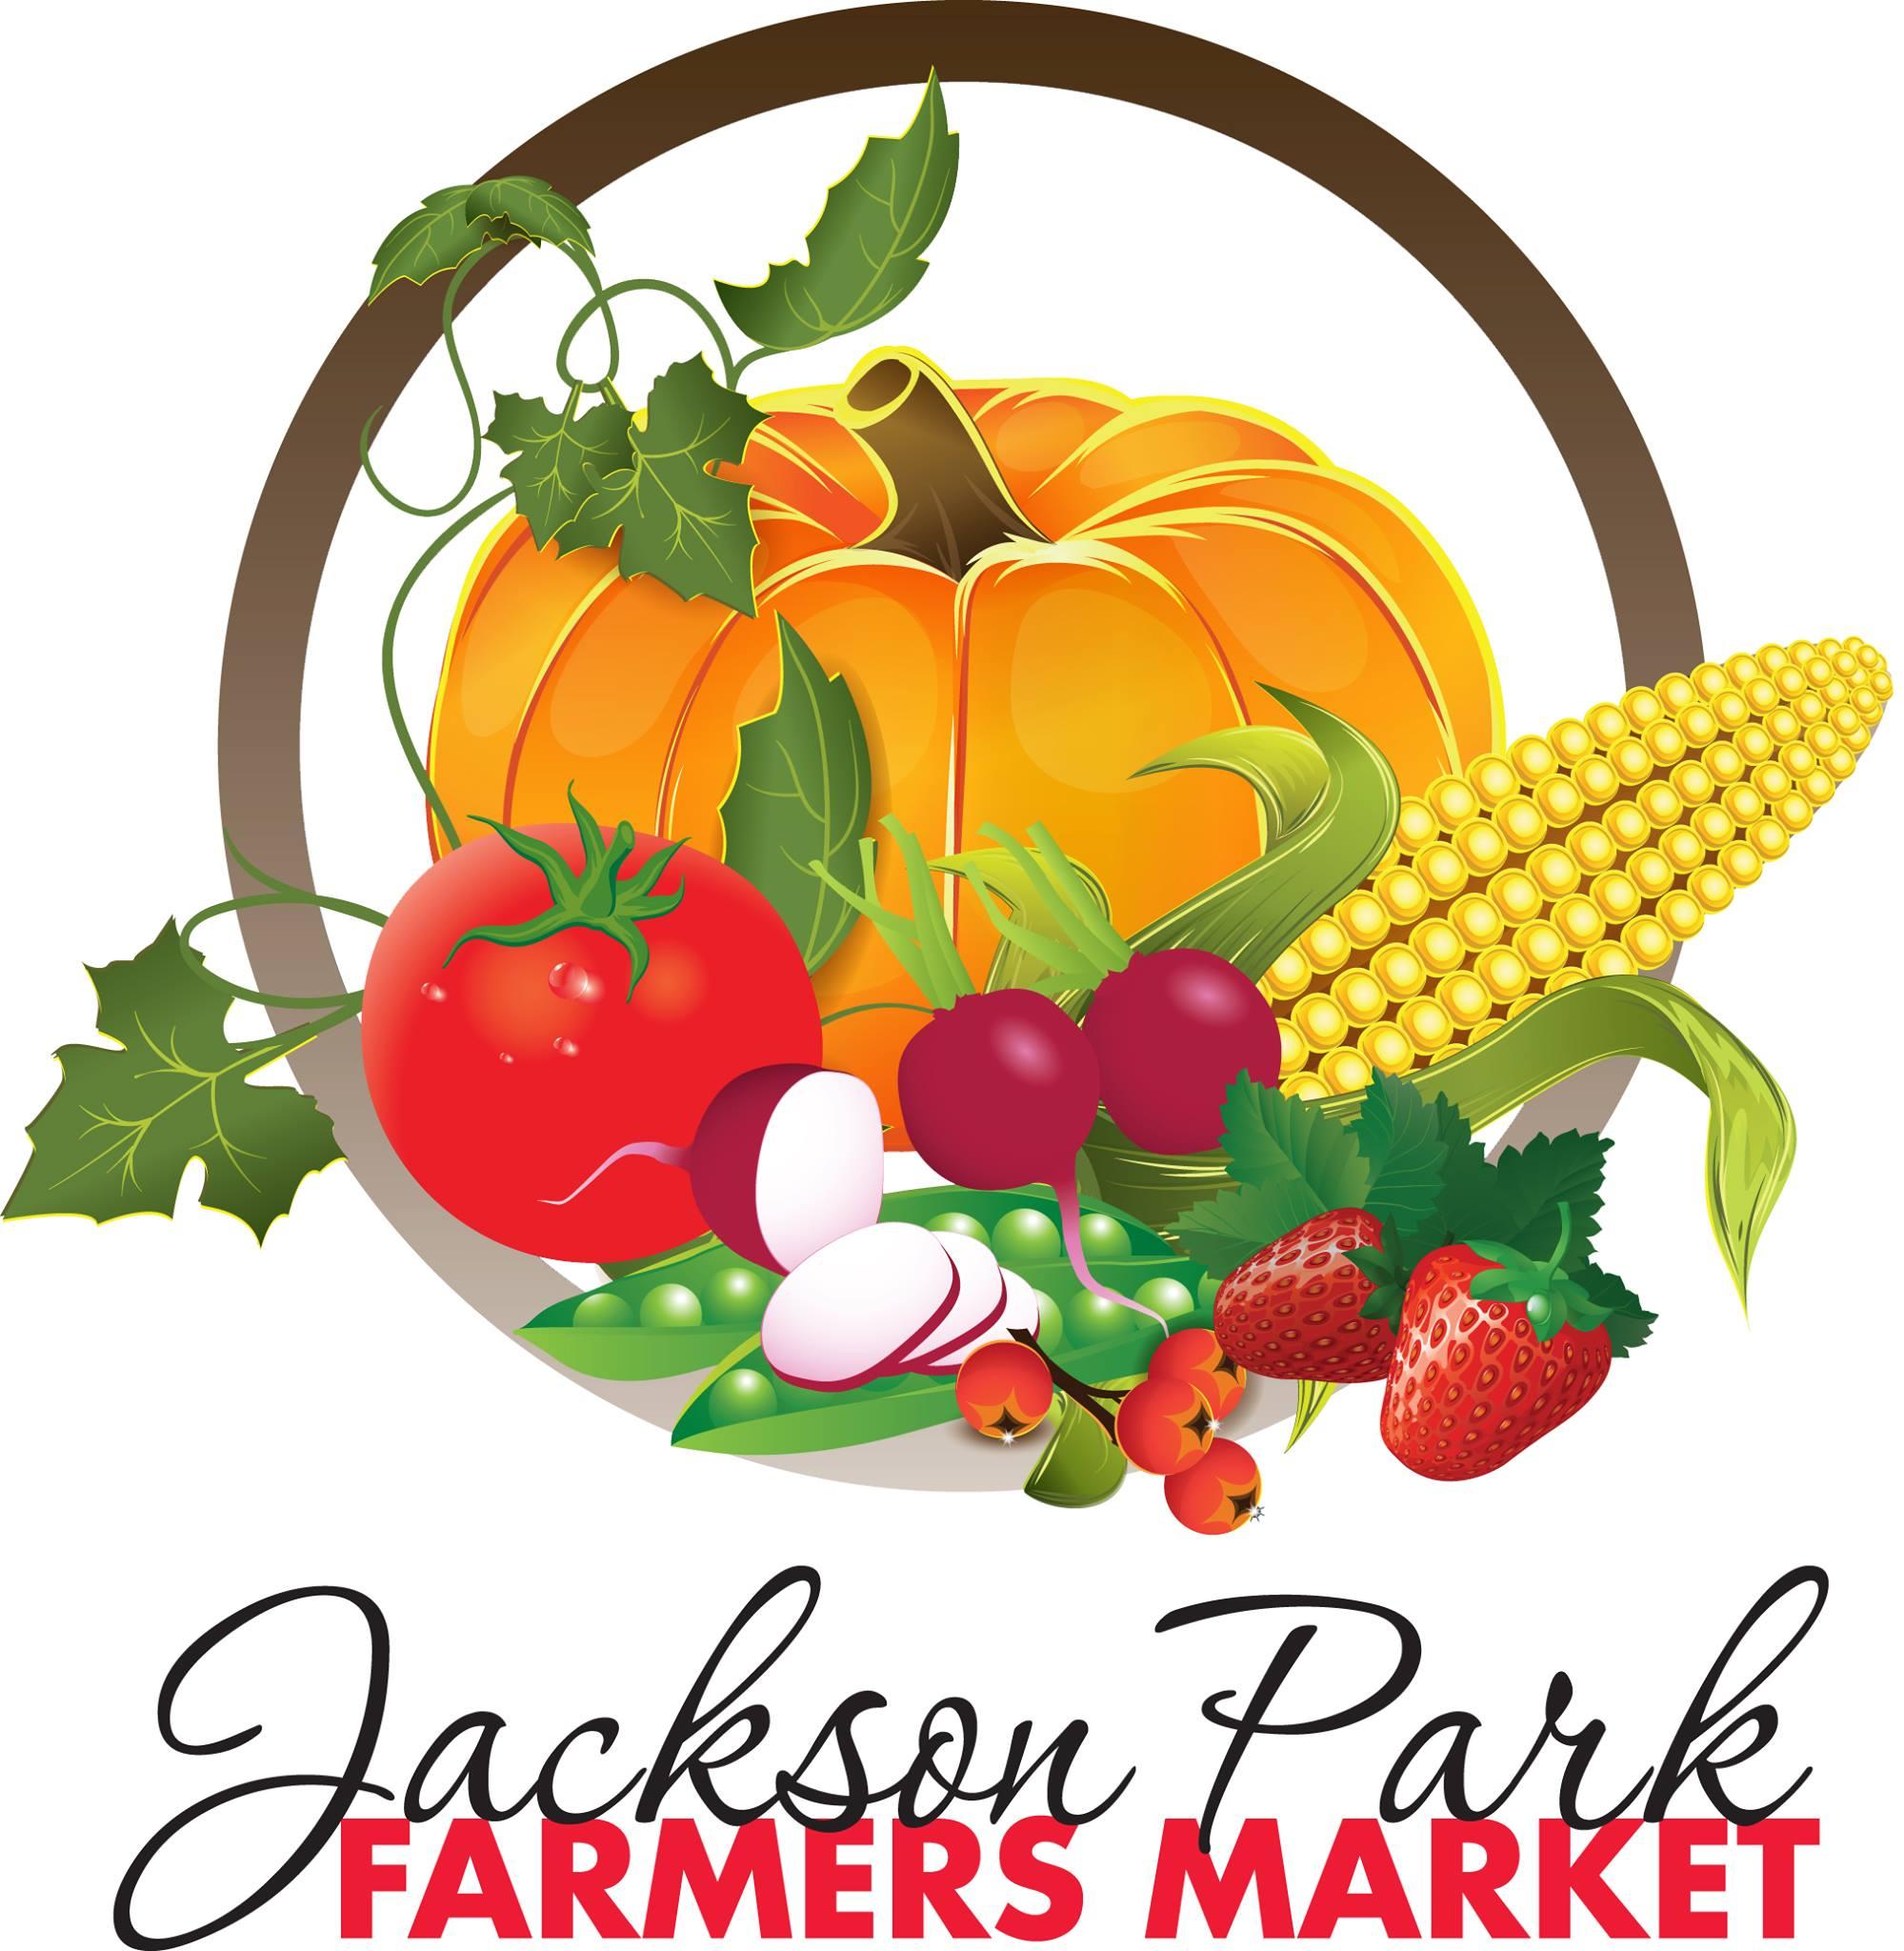 Jackson Park Farmers Market